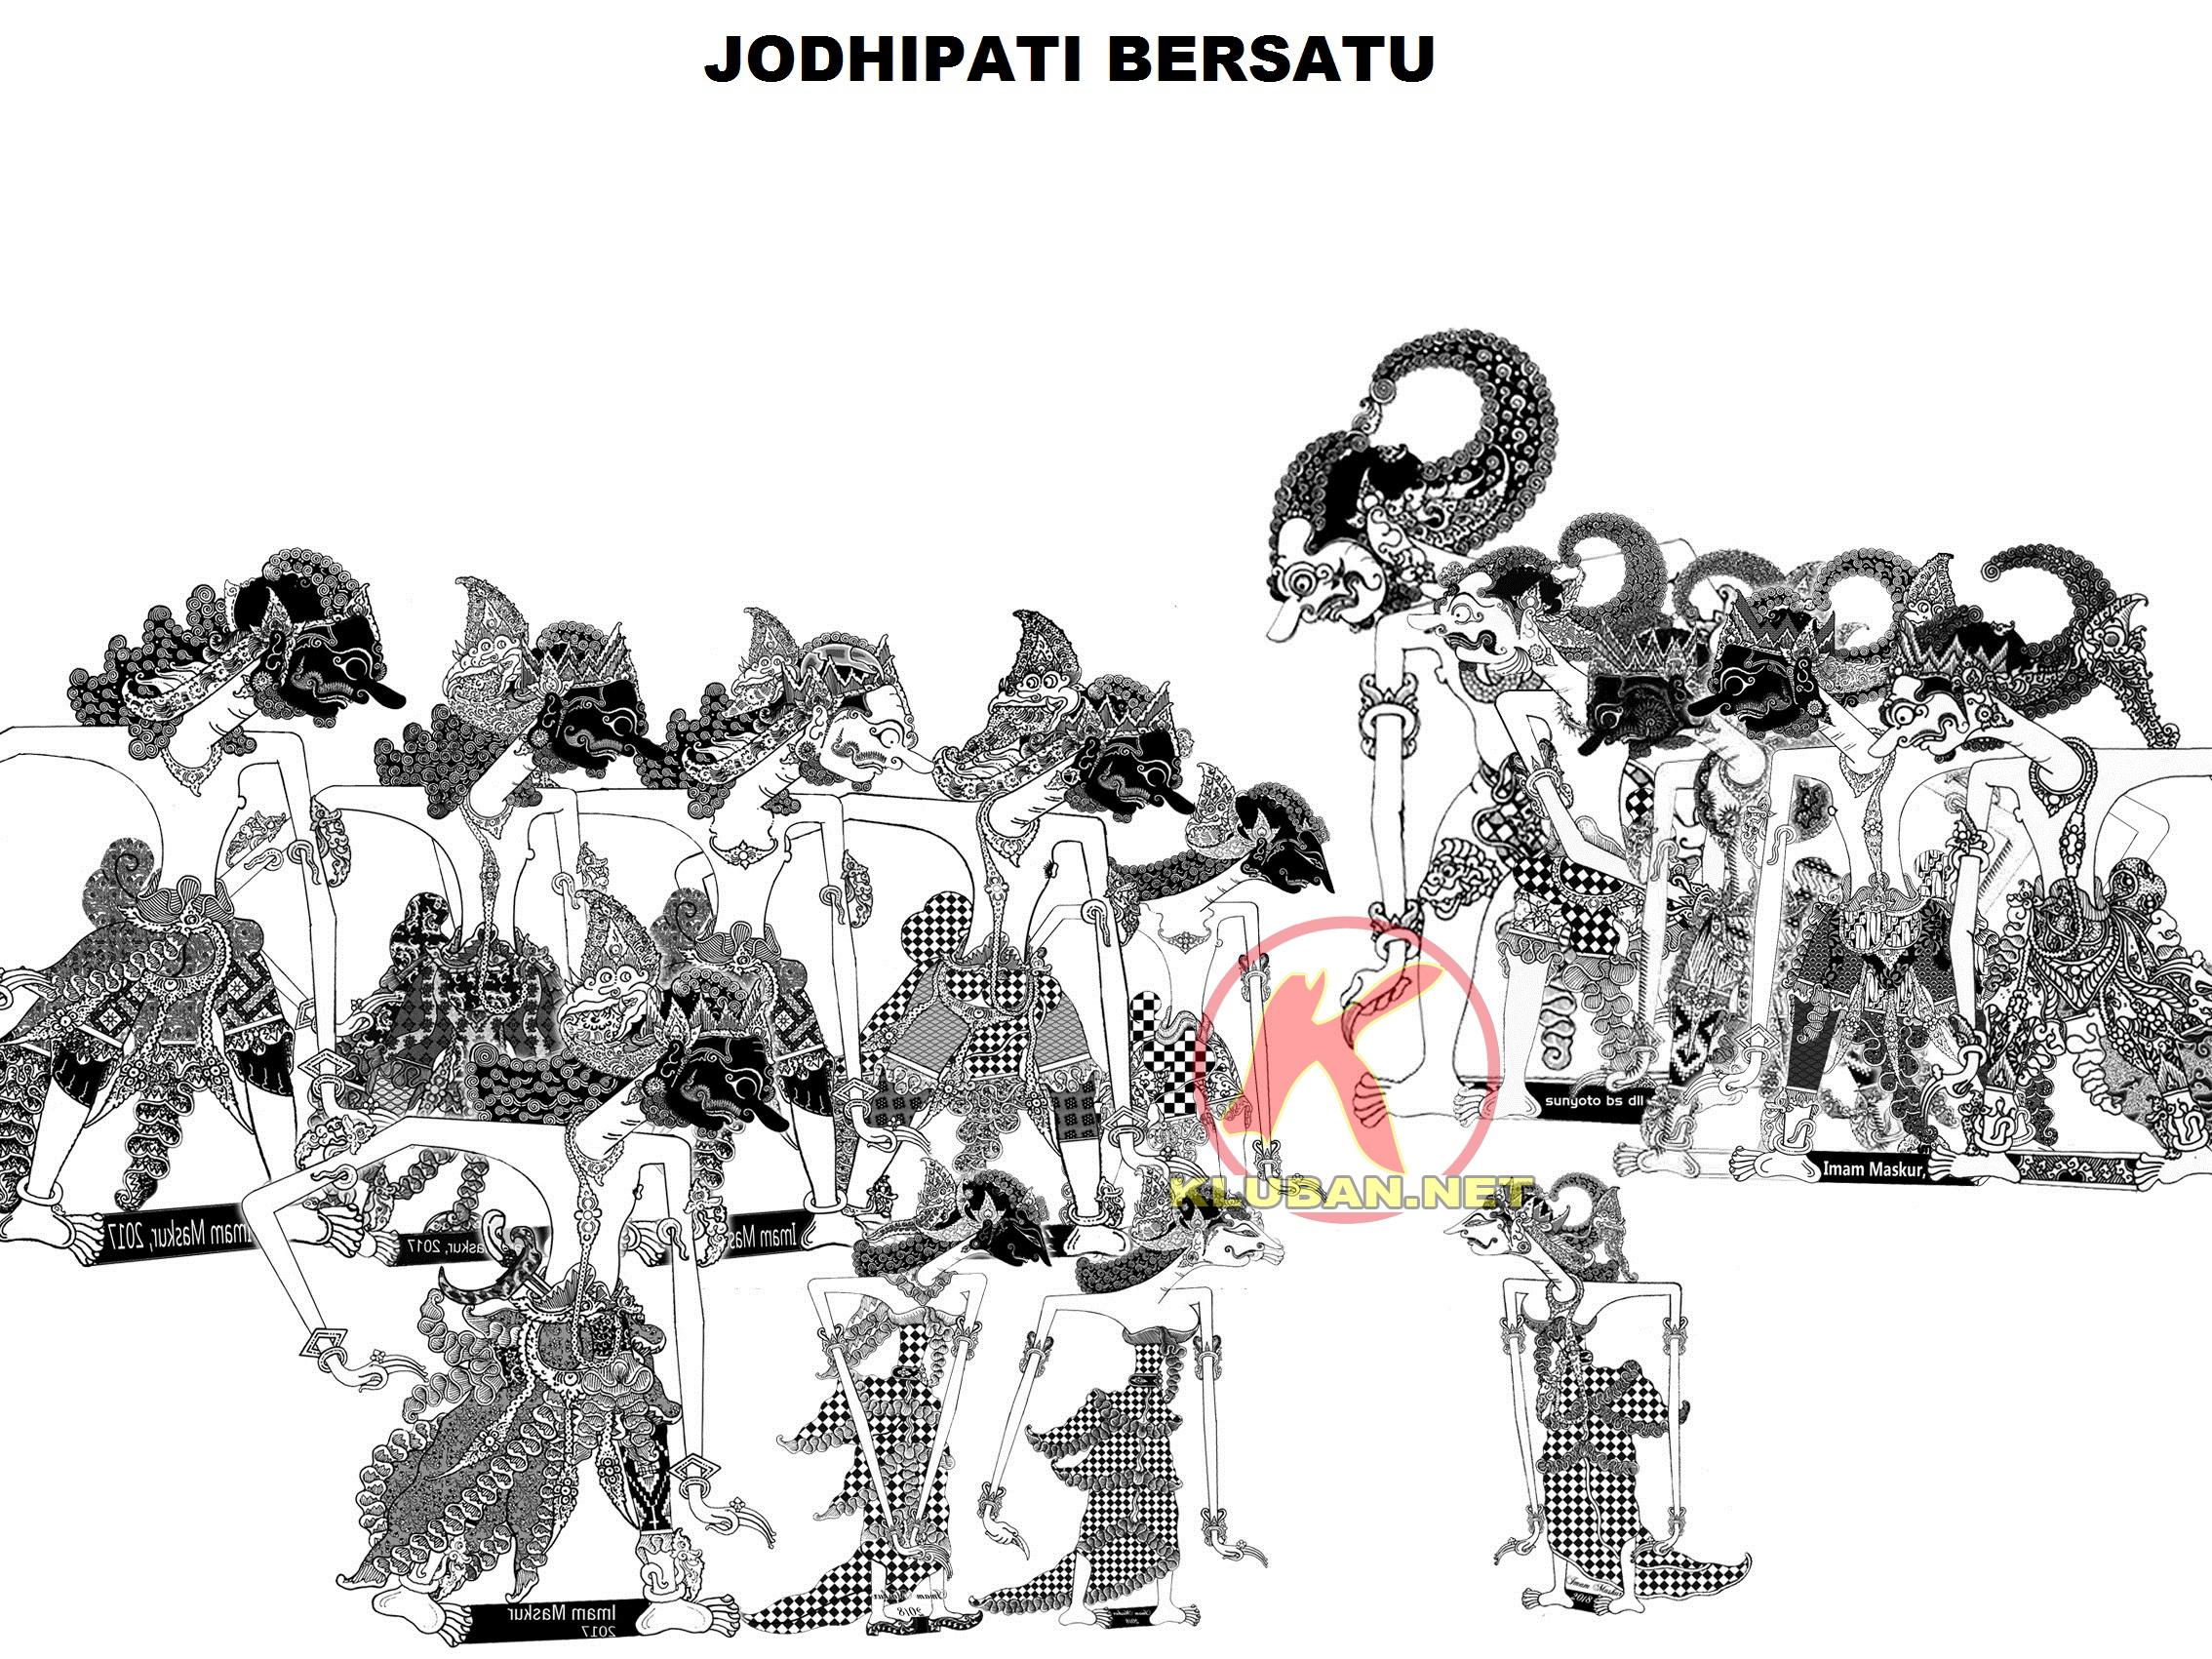 02/12/2020· 100 gambar wayang kulit arjuna pandawa semar werkudara 2019. Anak Anak Werkudara Multi Gagrag